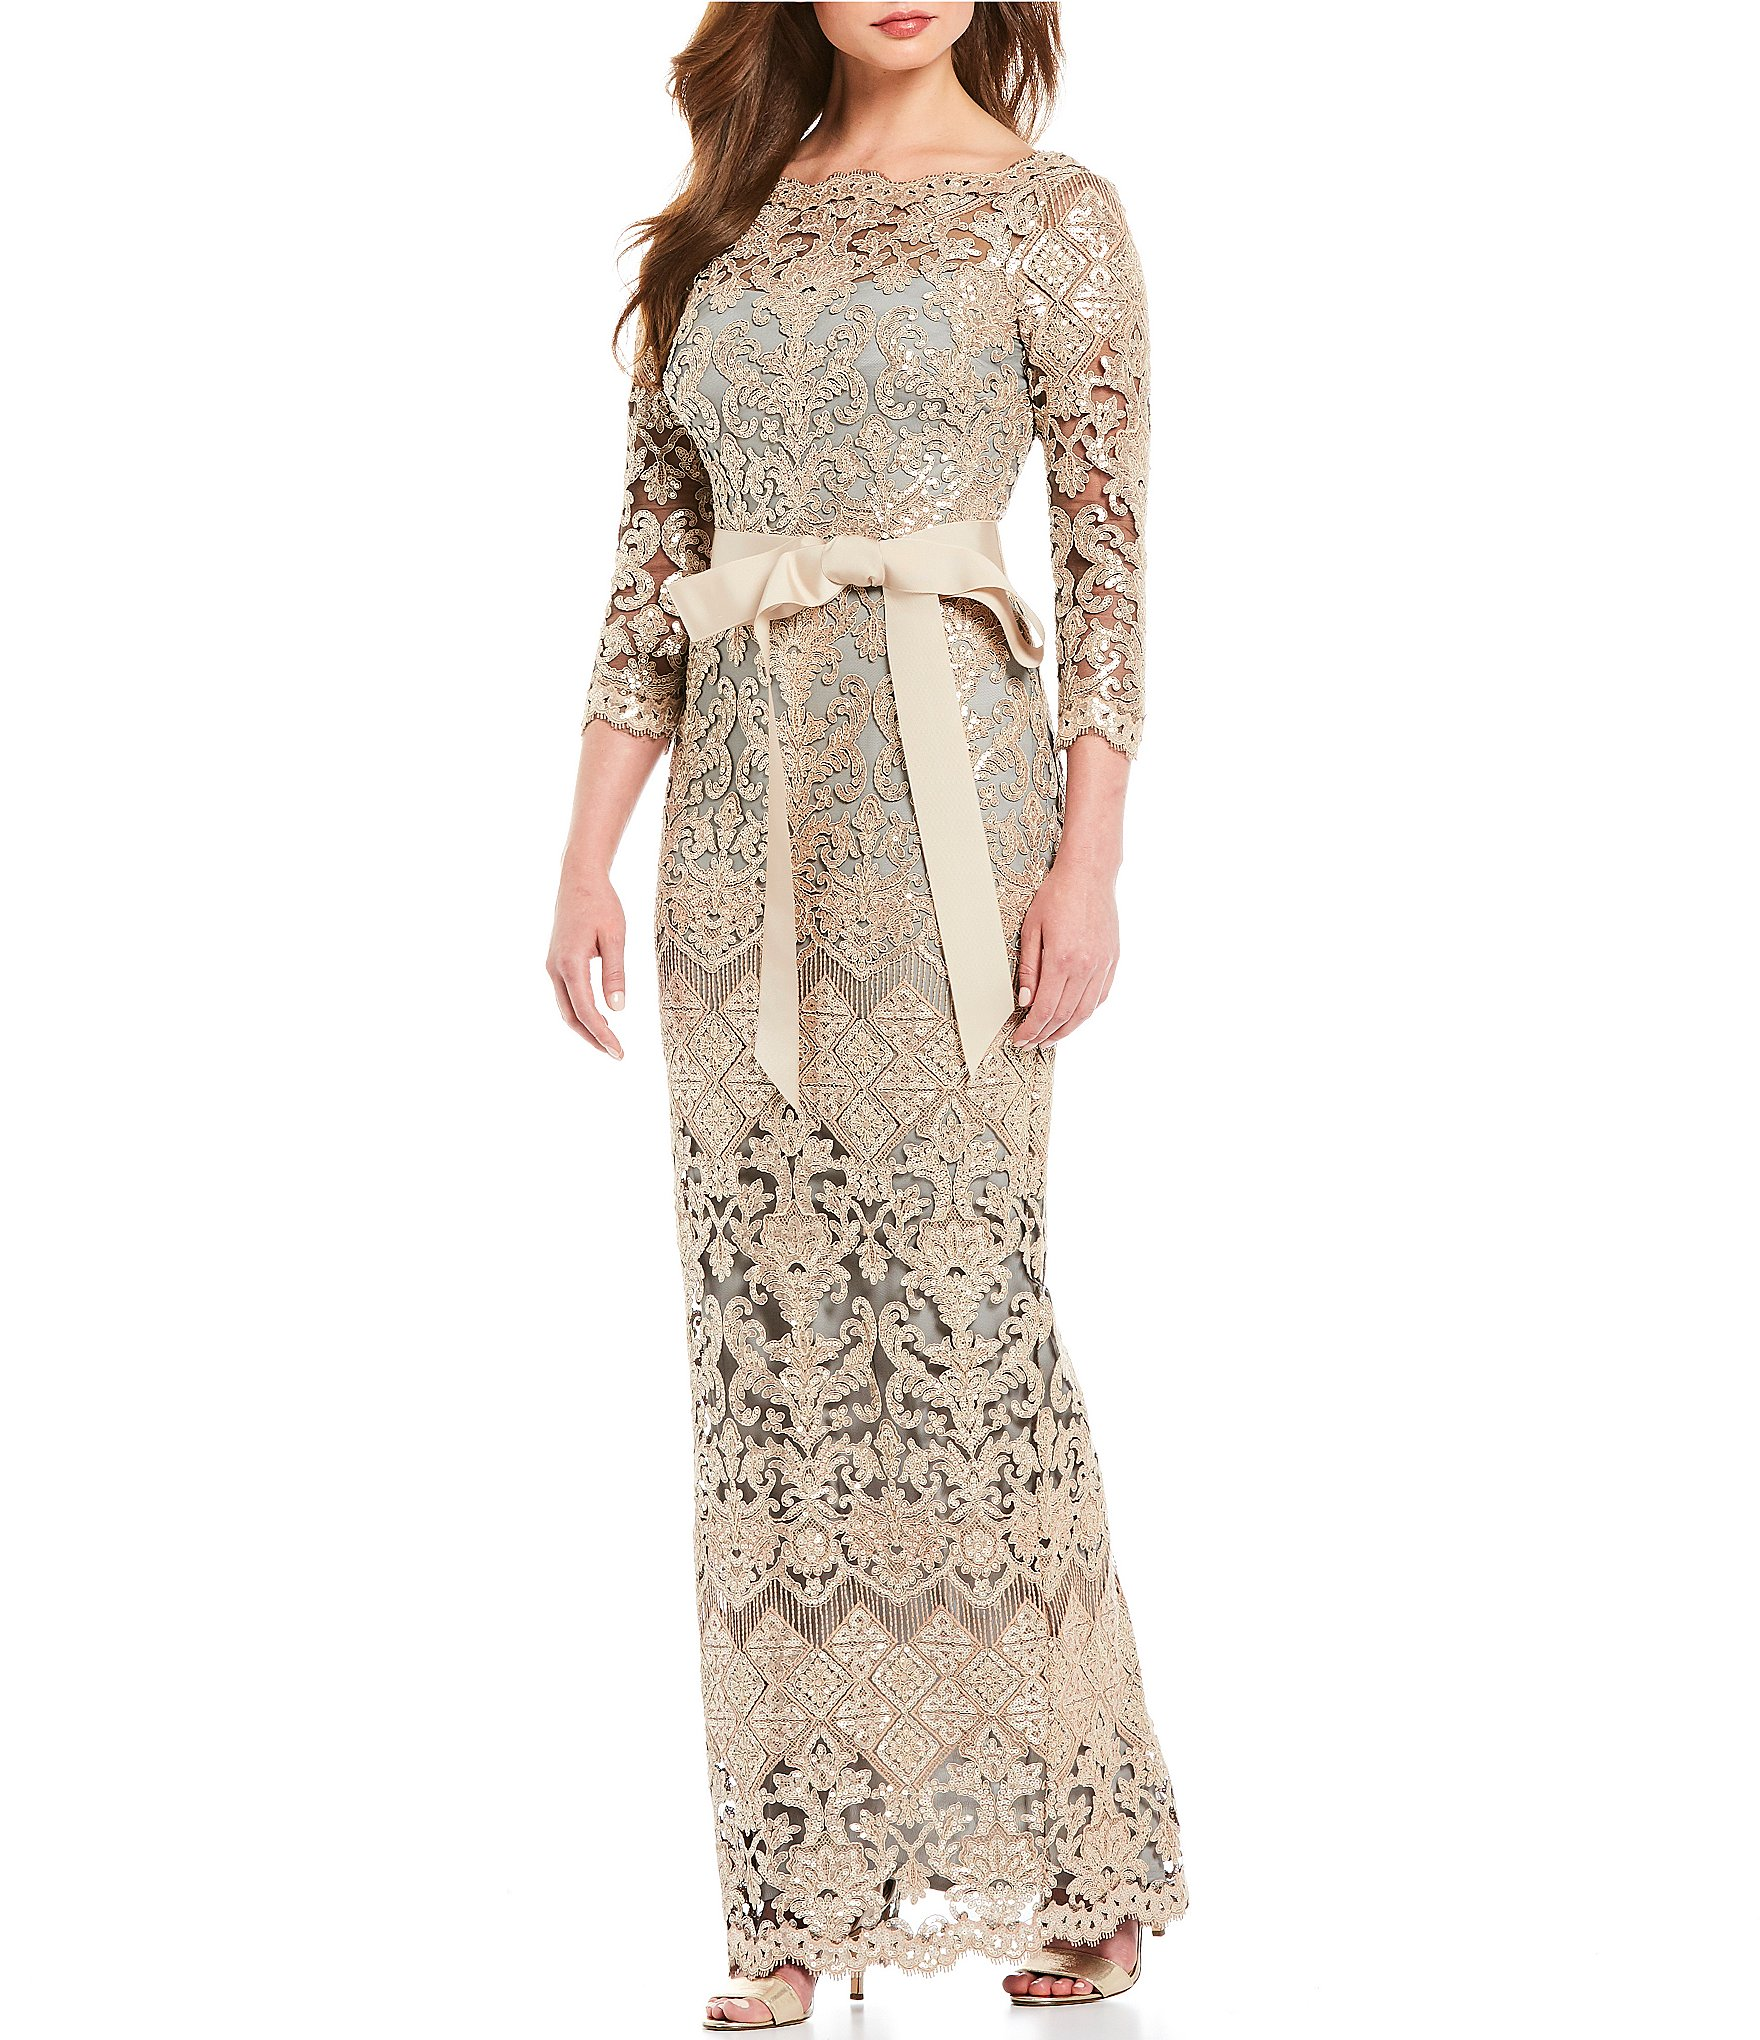 Tadashi Shoji Boat Neck Sequin Lace Illusion Ribbon Belt Gown